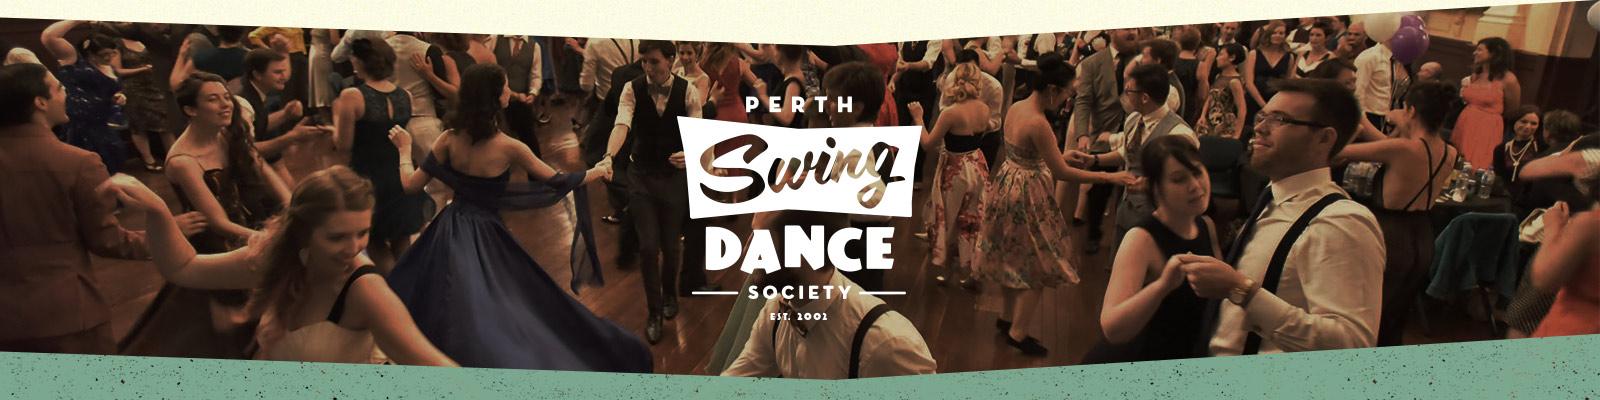 Perth Swing - Photo by Fudz Qazi